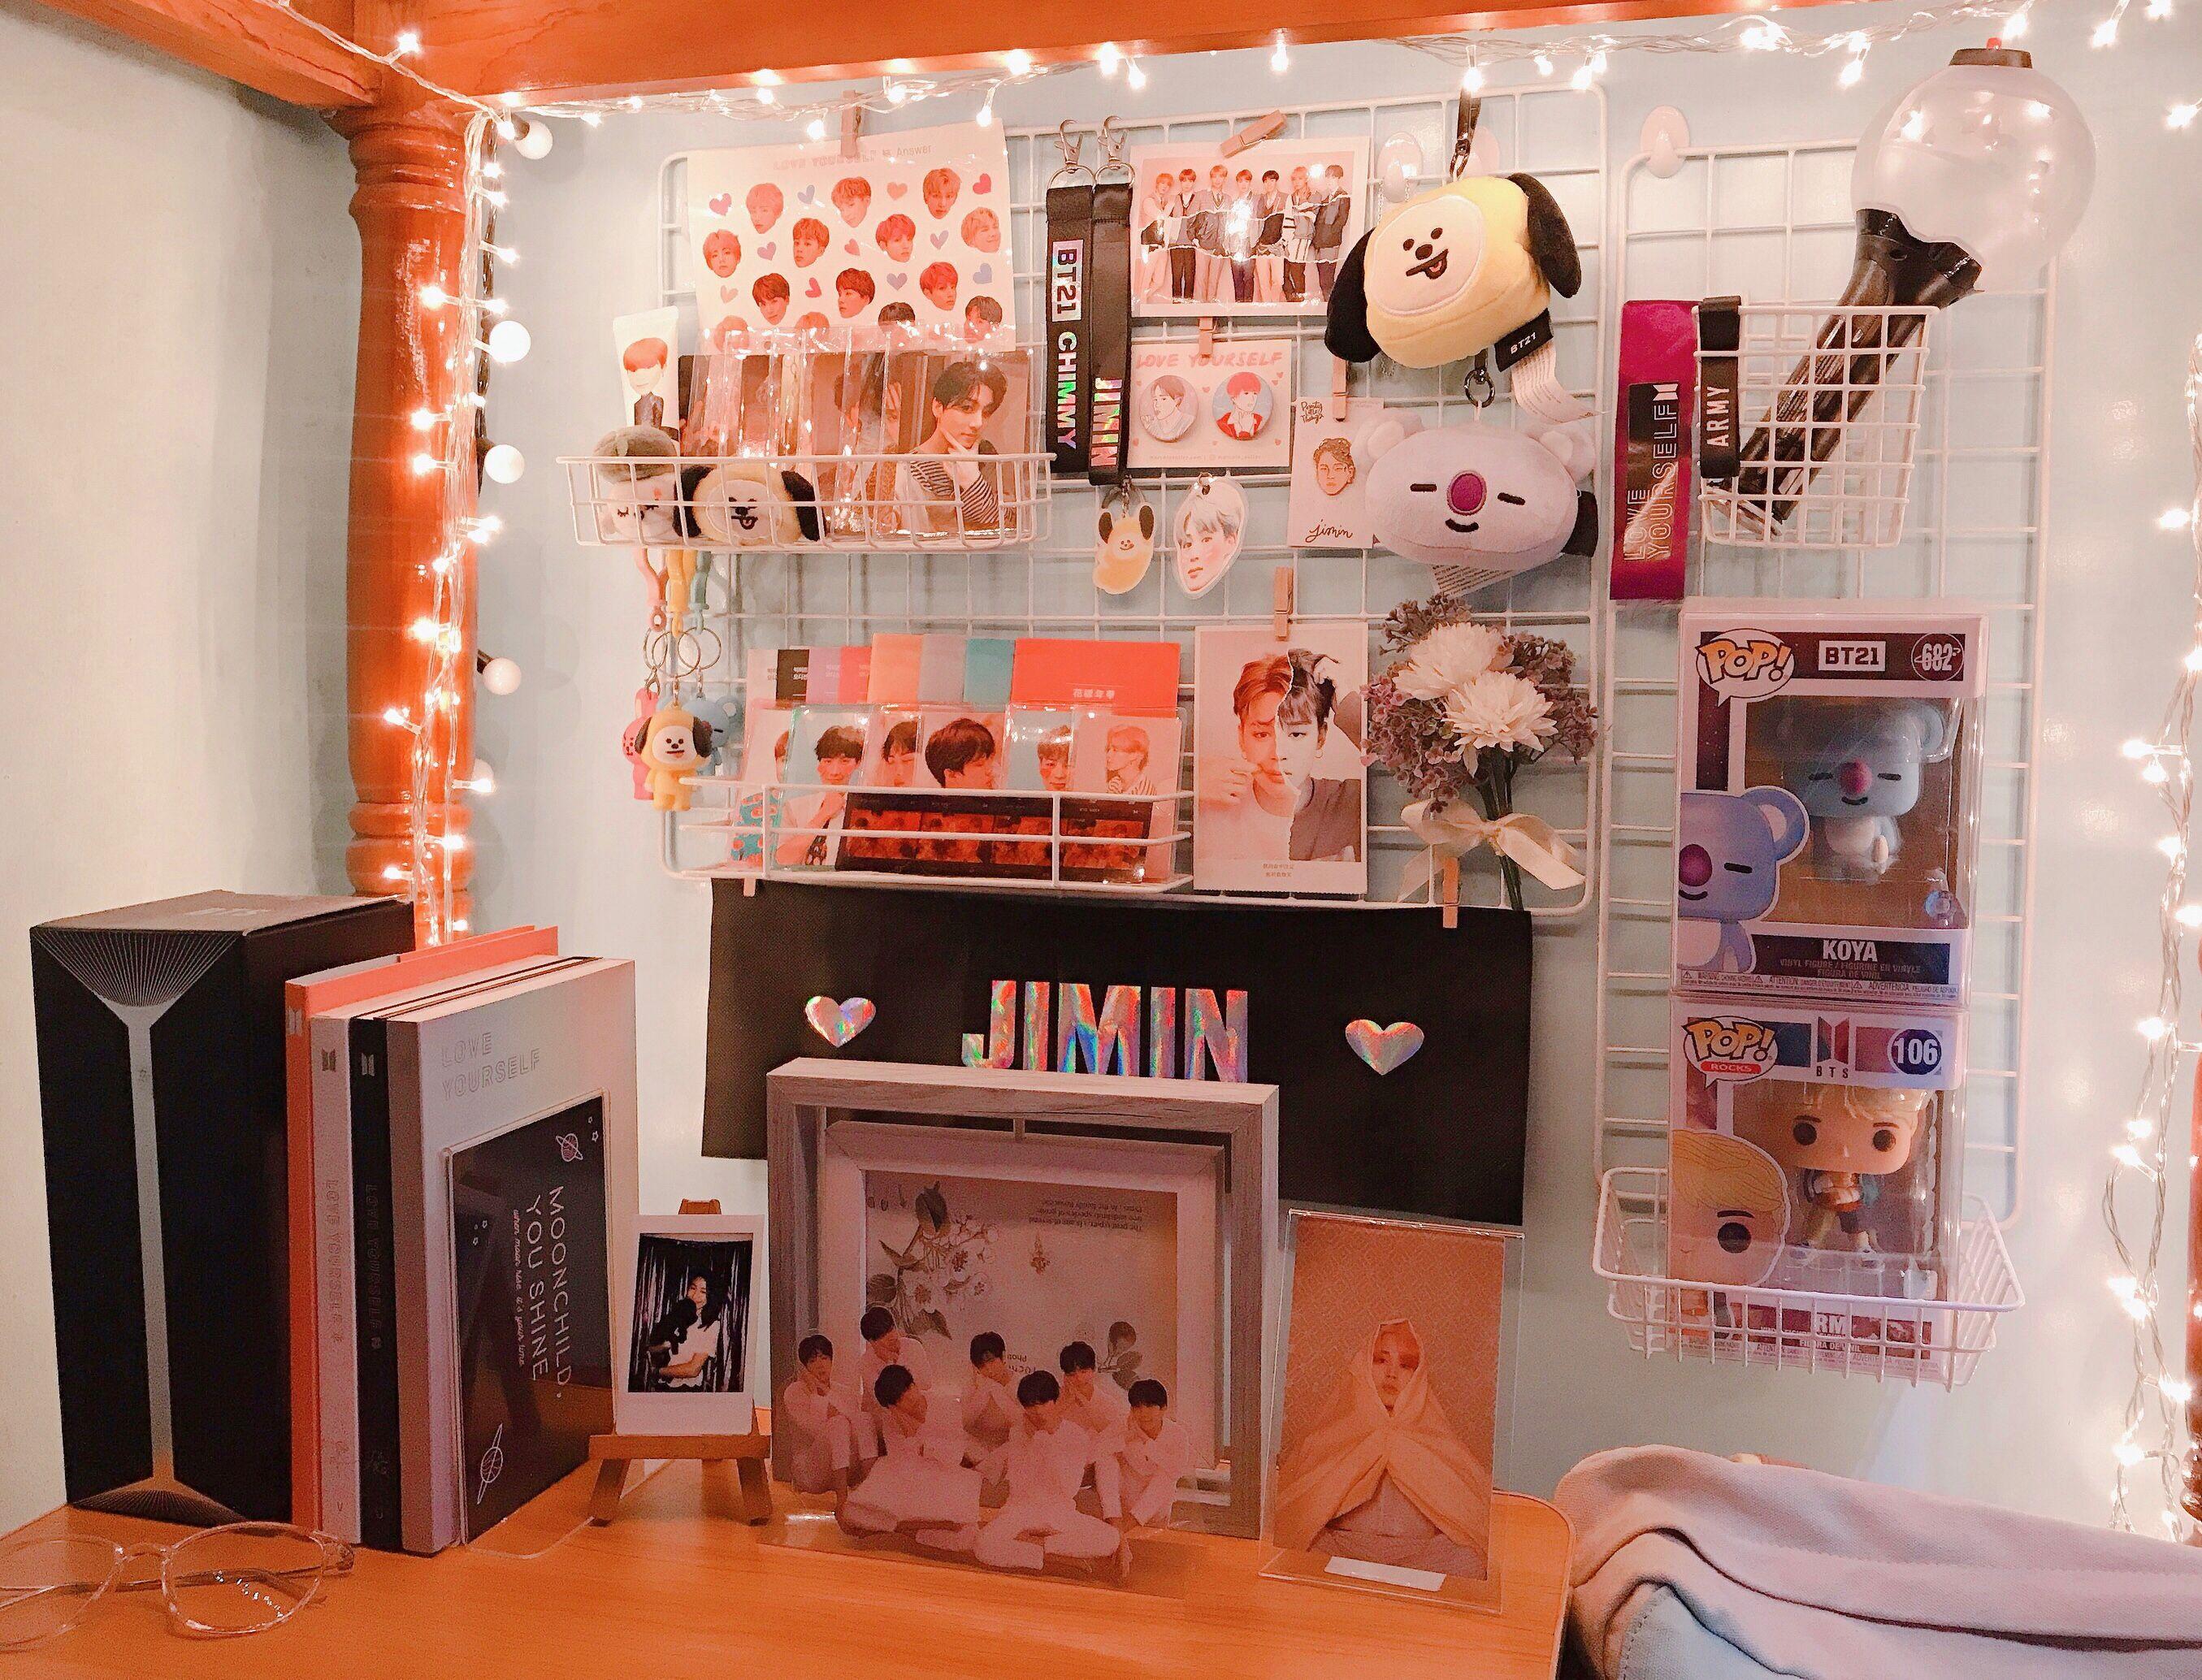 Kpop Room Bts Army Army Room Decor Room Makeover Inspiration Room Organization Bedroom